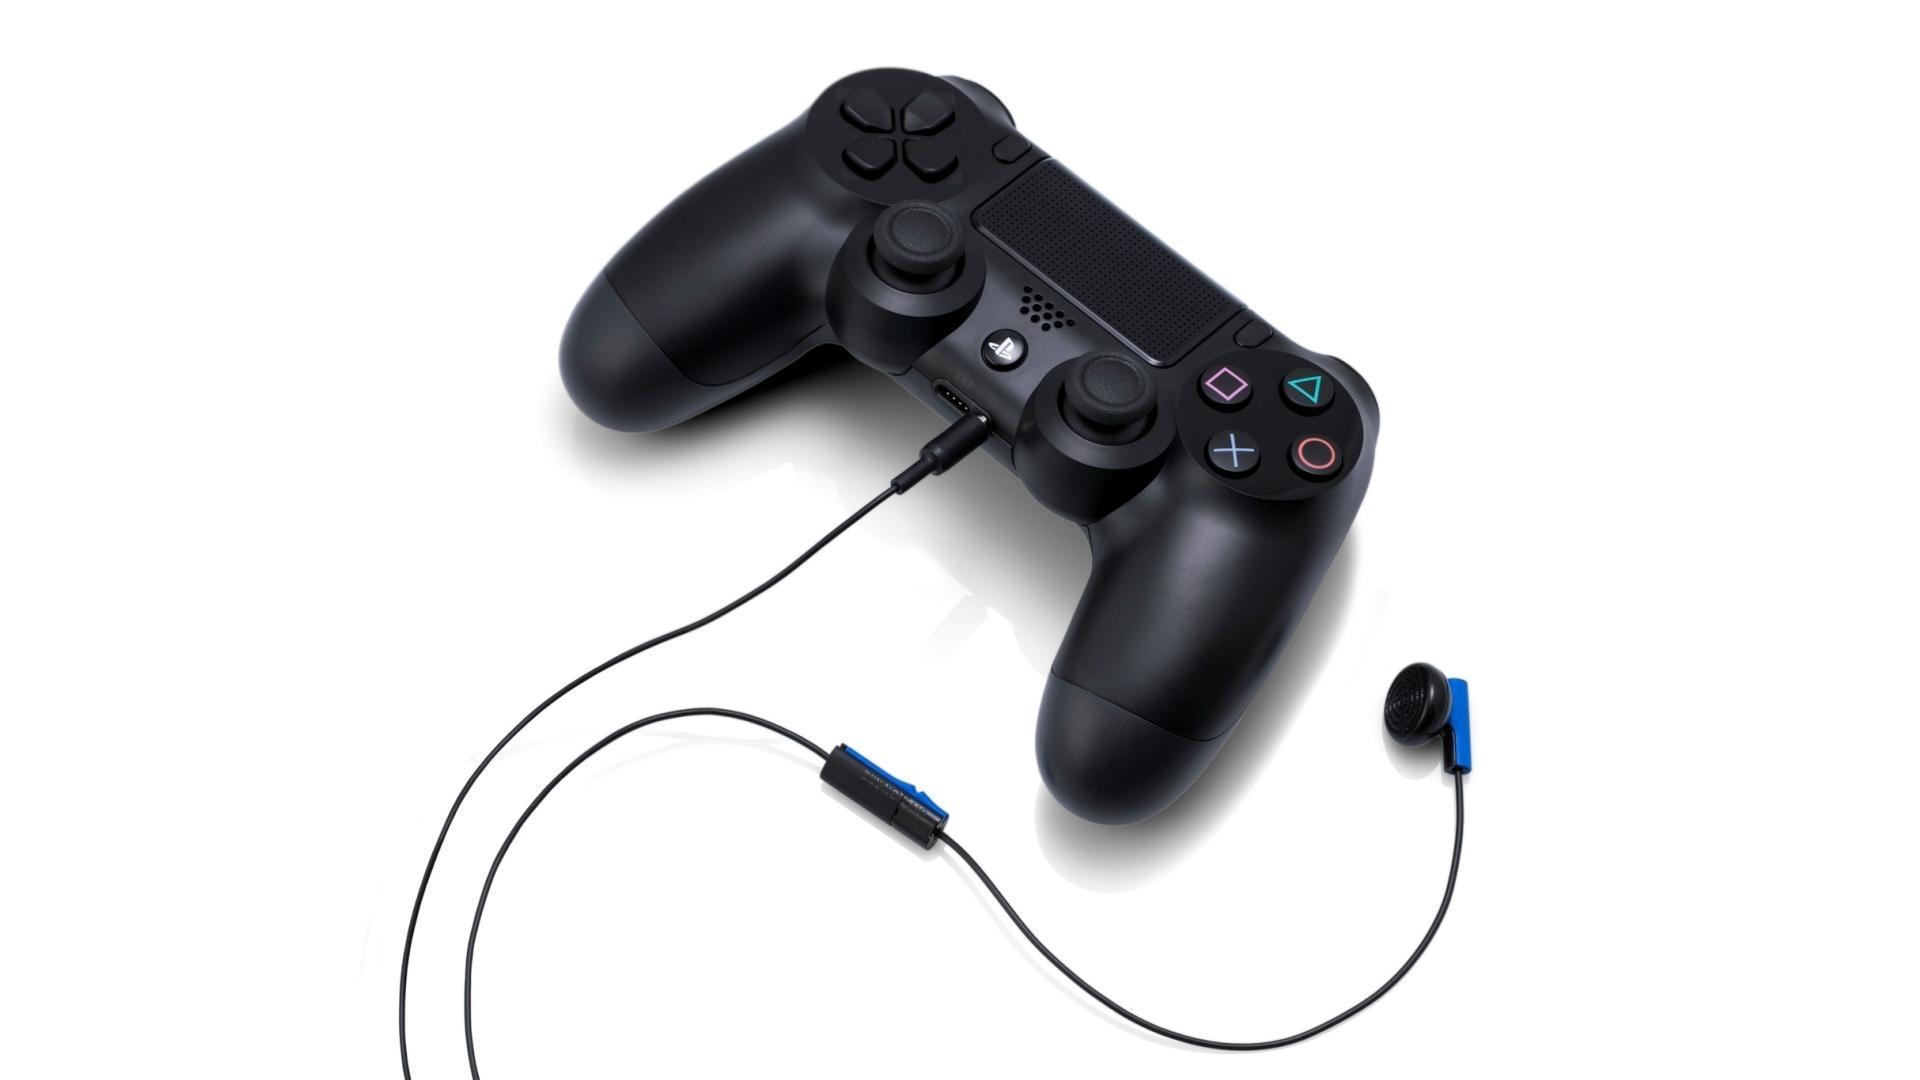 Black Playstation 4 Controller Wallpaper 2946